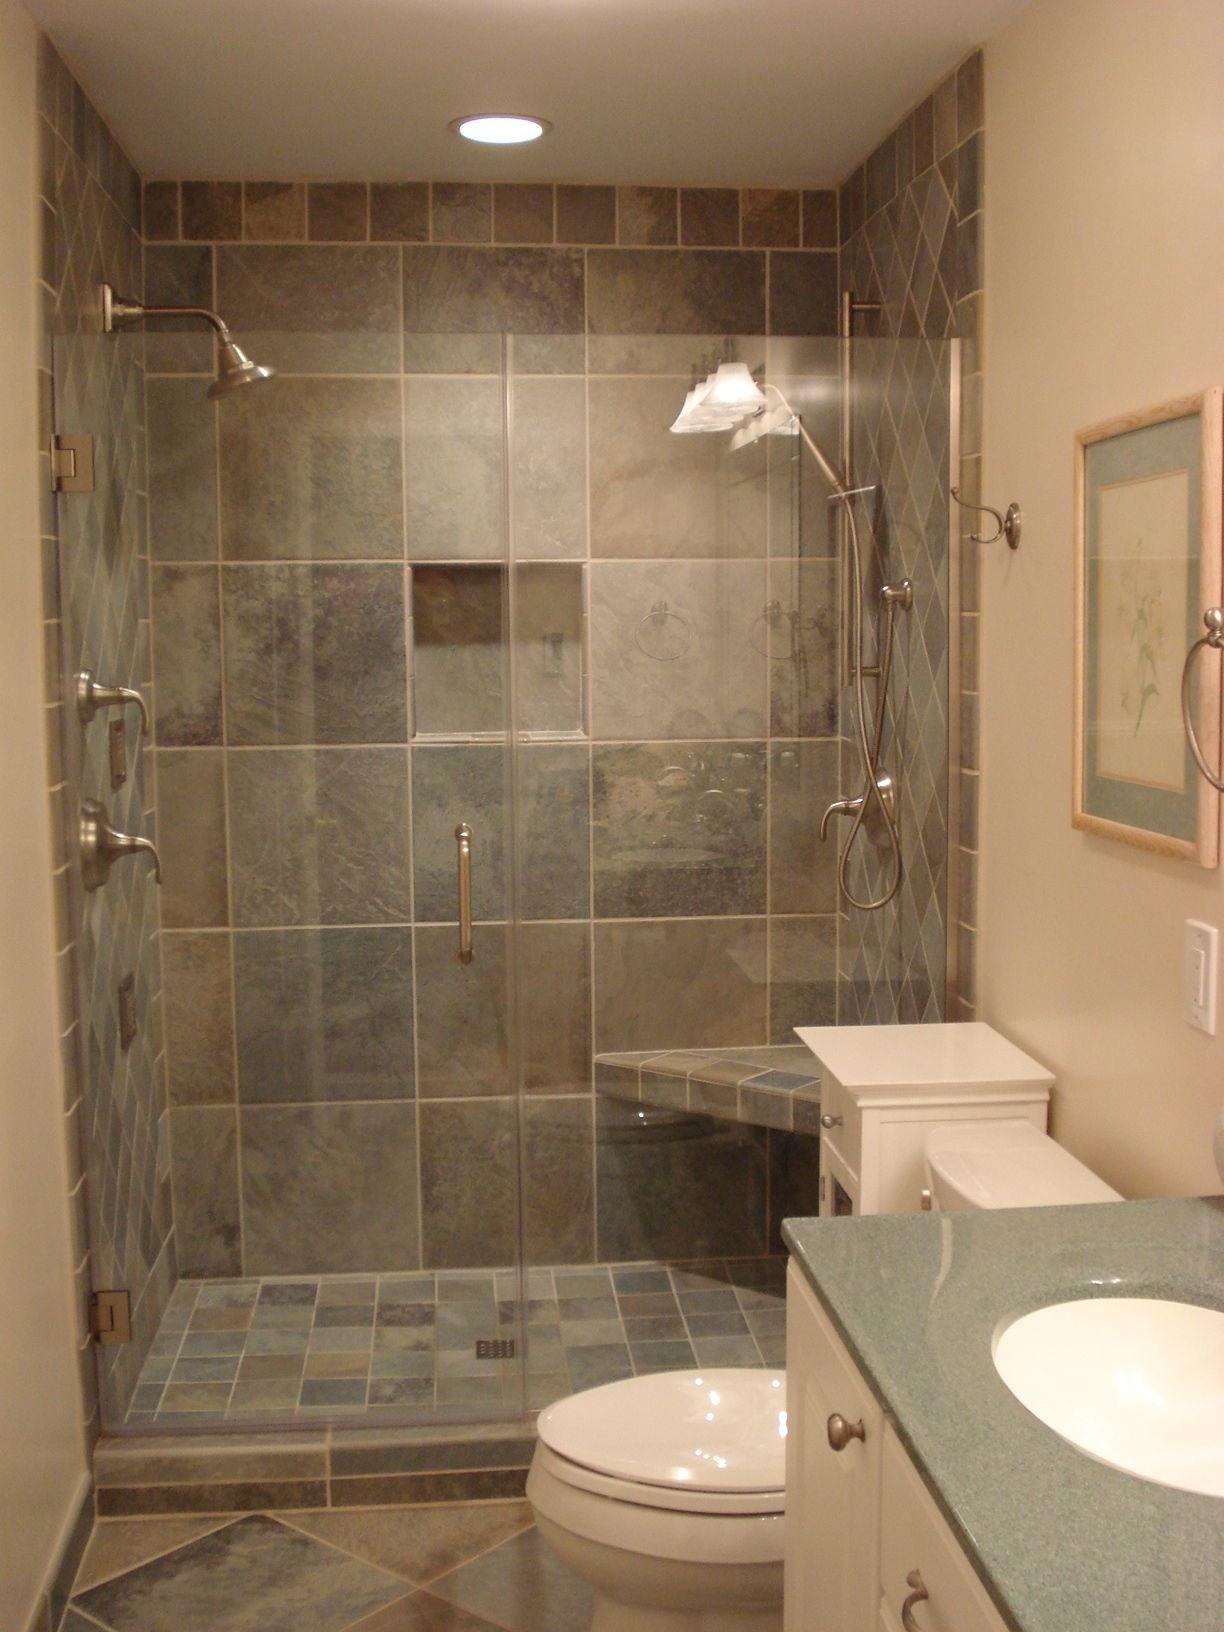 tiny bathroom remodel idea 30 Best Bathroom Remodel Ideas You Must Have a Look | Bathroom Remodel Ideas | Bathroom, Cheap